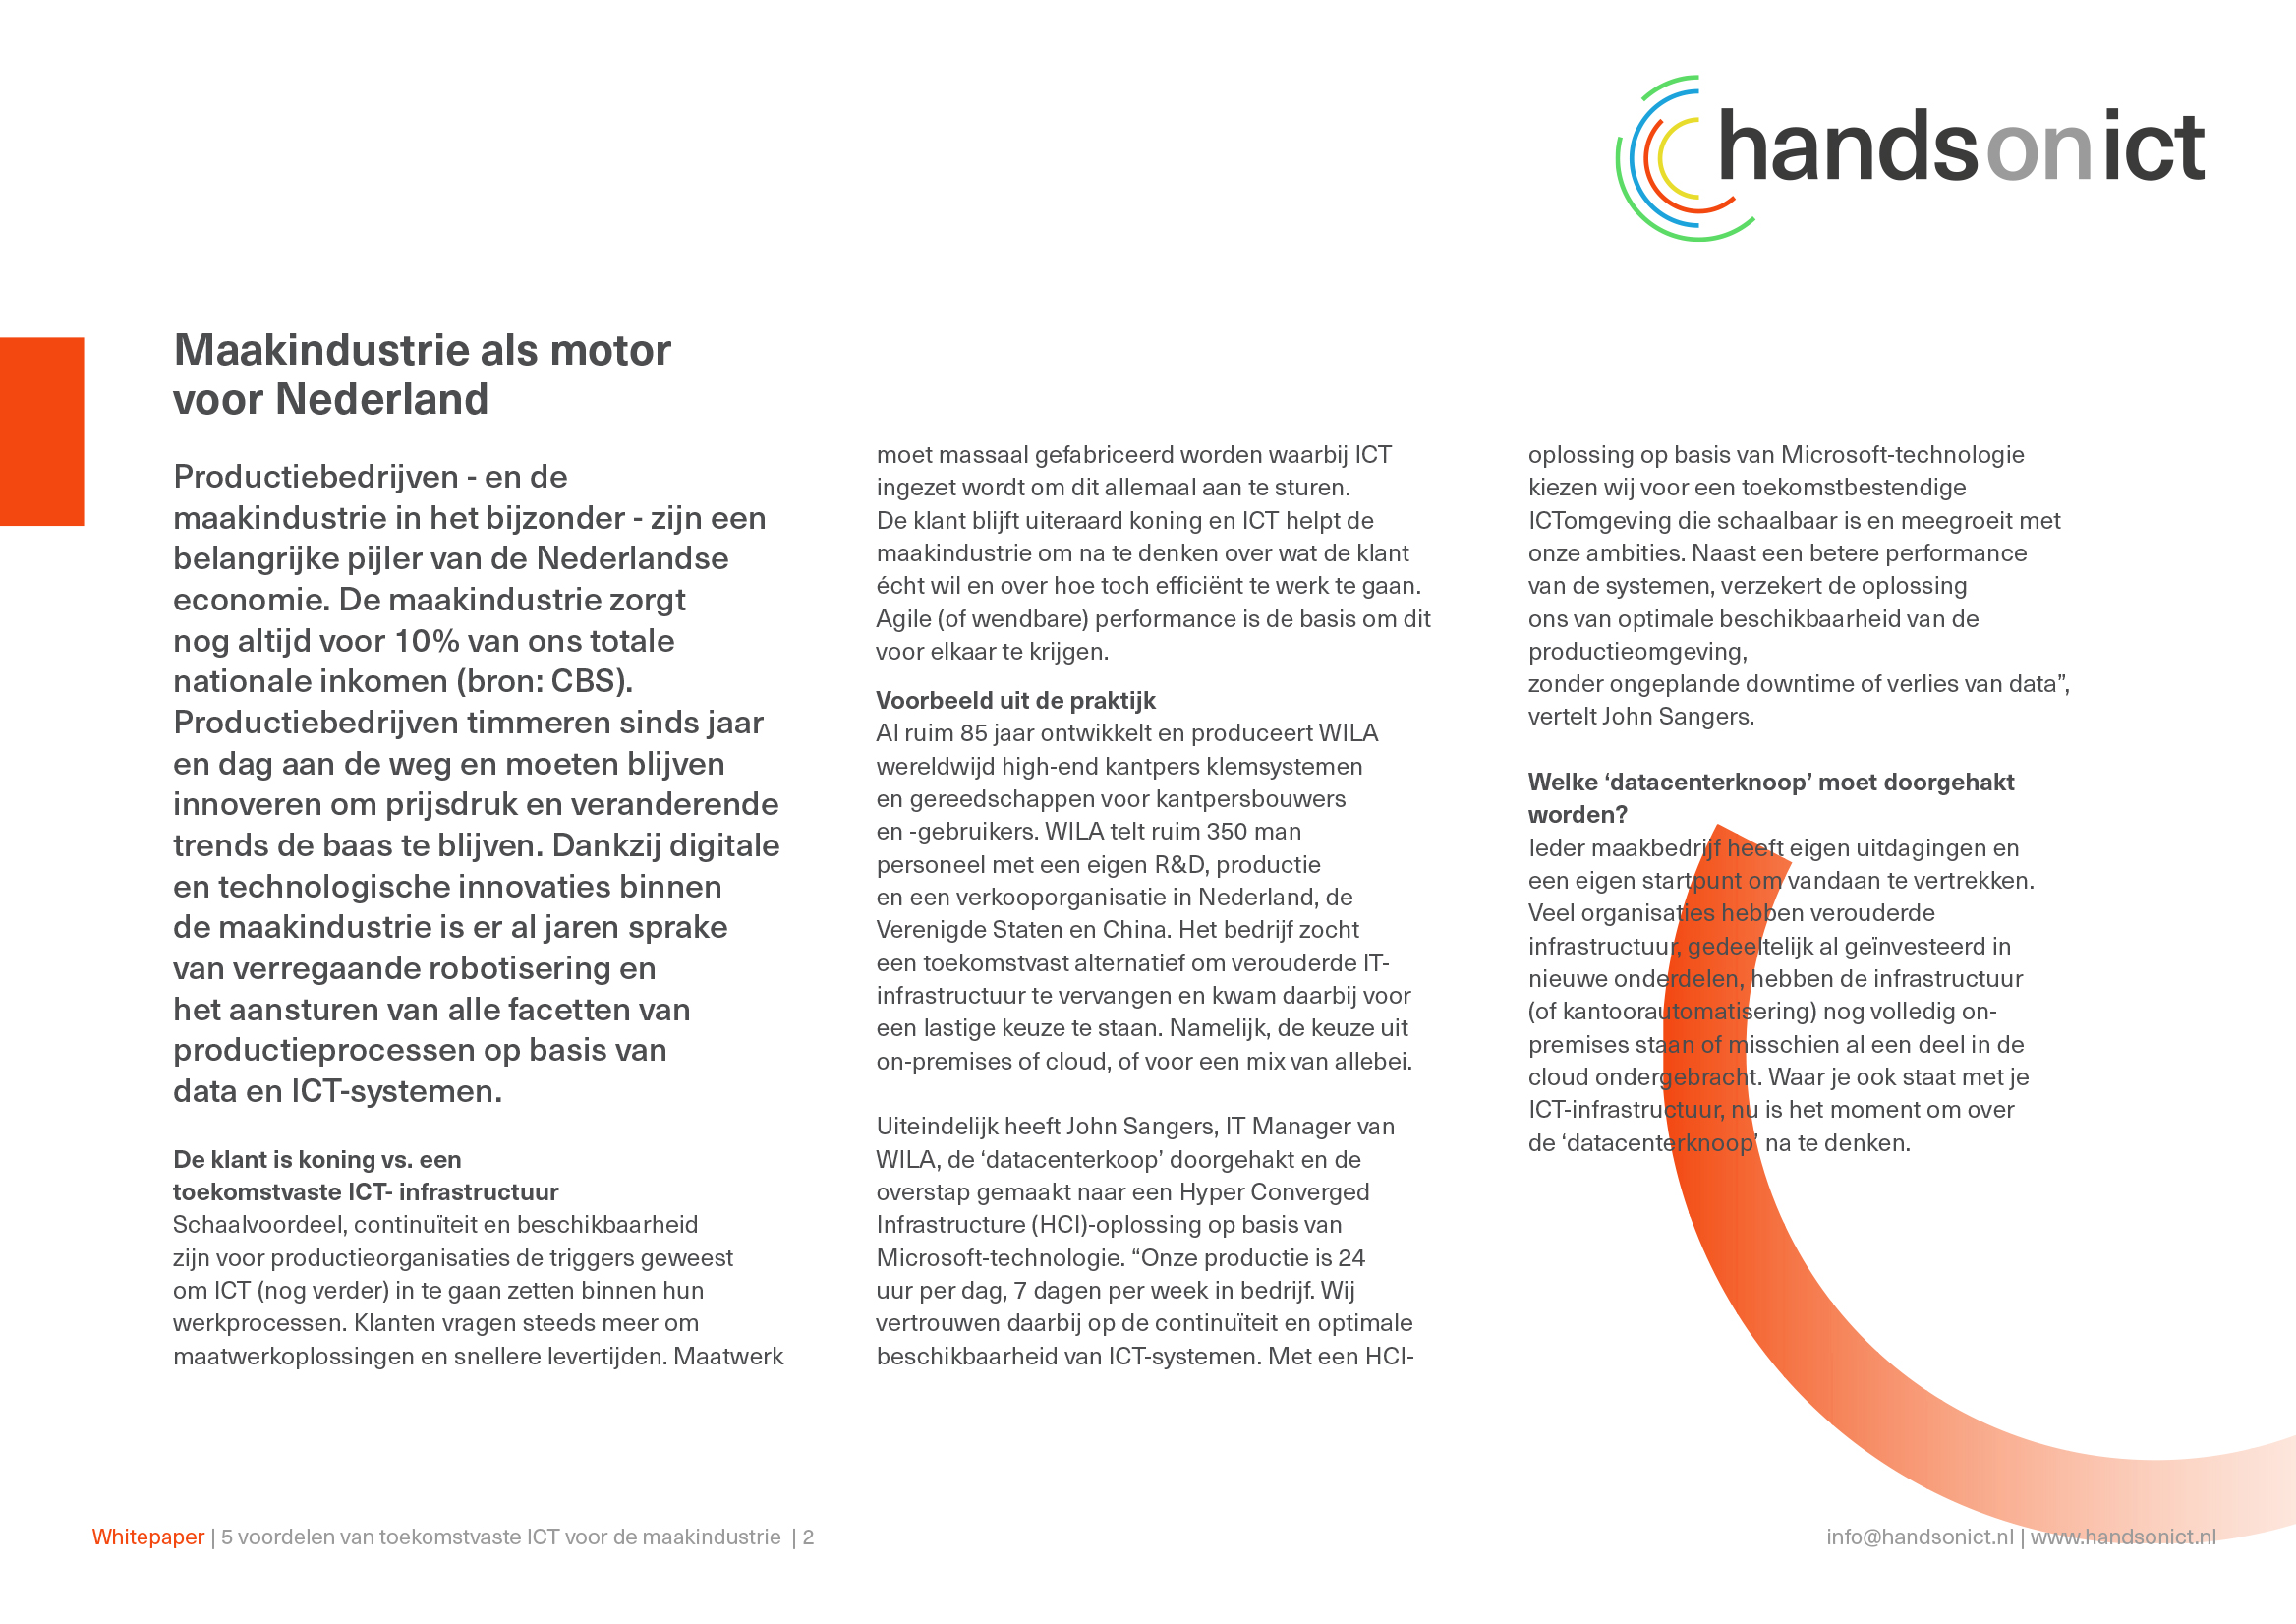 Sneak preview_2 whitepaper 5 voordelen toekomstvaste ICT